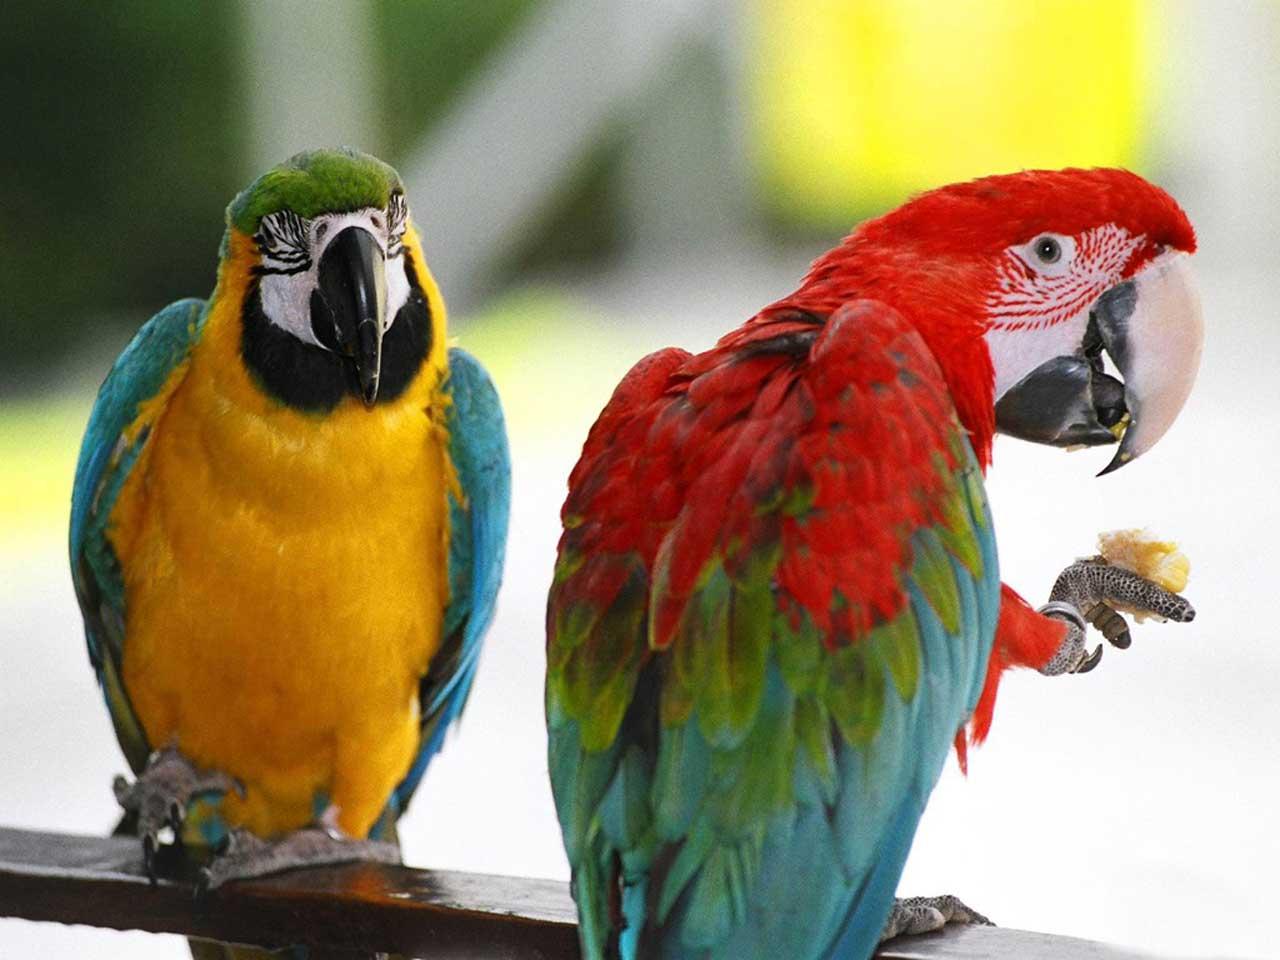 http://2.bp.blogspot.com/-MNkN1y-UVJs/Tkkzf3NZC8I/AAAAAAAAAAo/Z1ejFVTn7v4/s1600/australian-parrots-pair-wallpaper.jpg